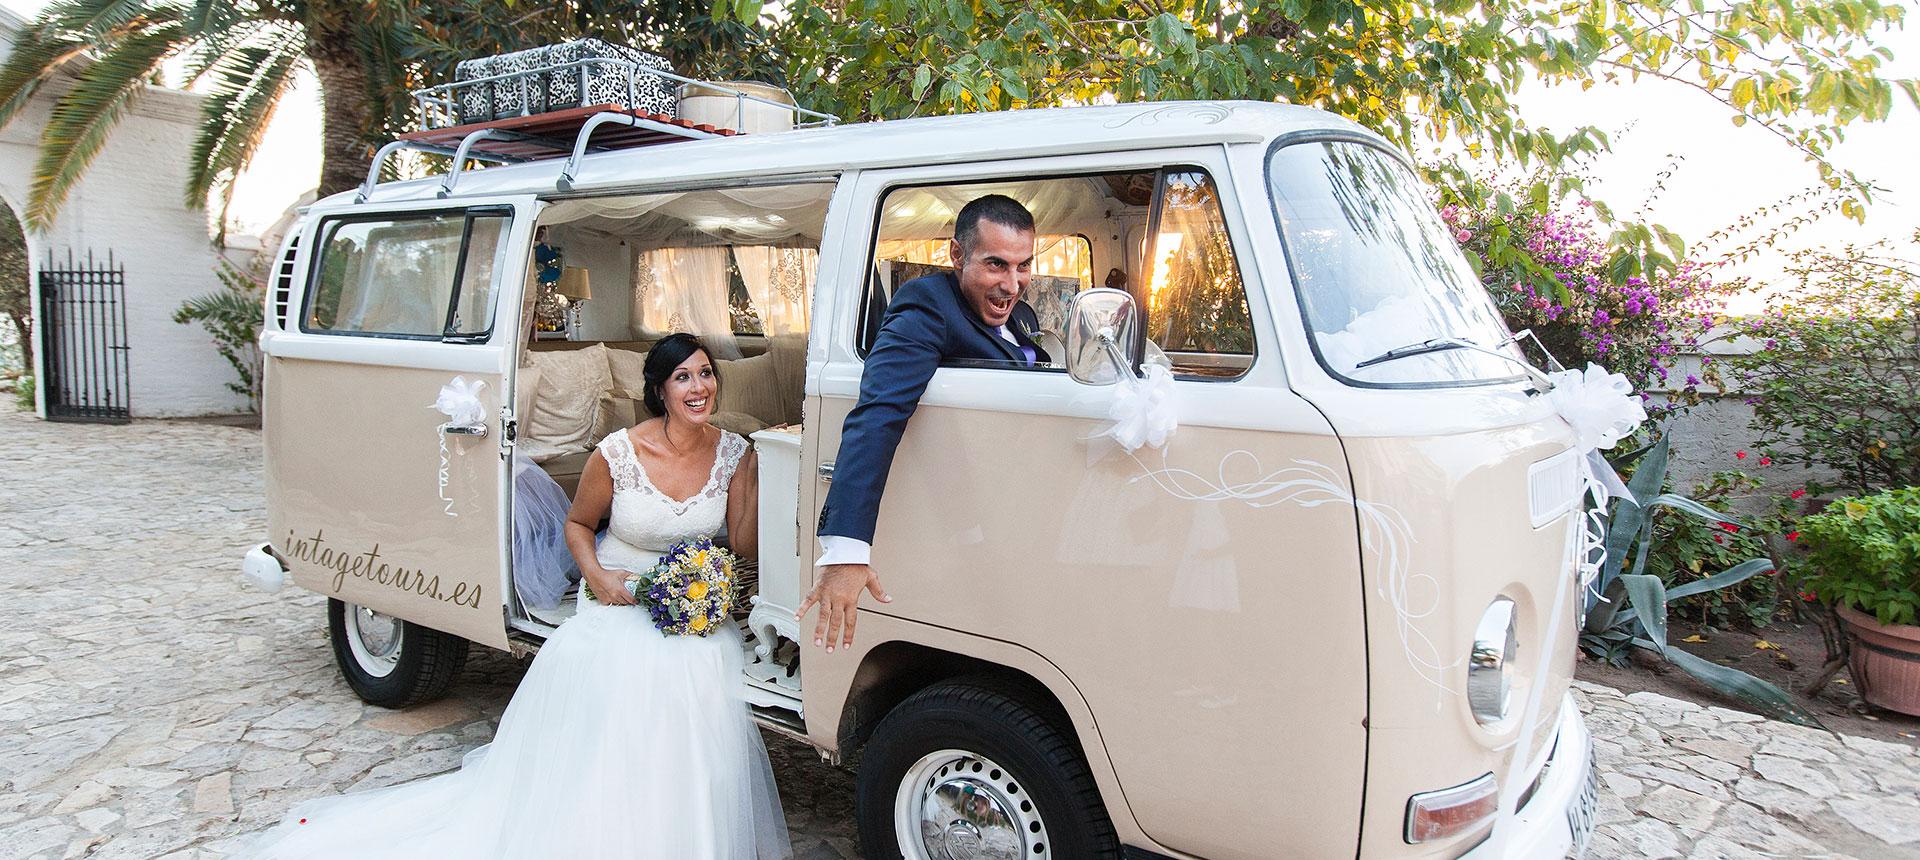 fotografia-bodas-valencia-felguera-fotografo-36-slide